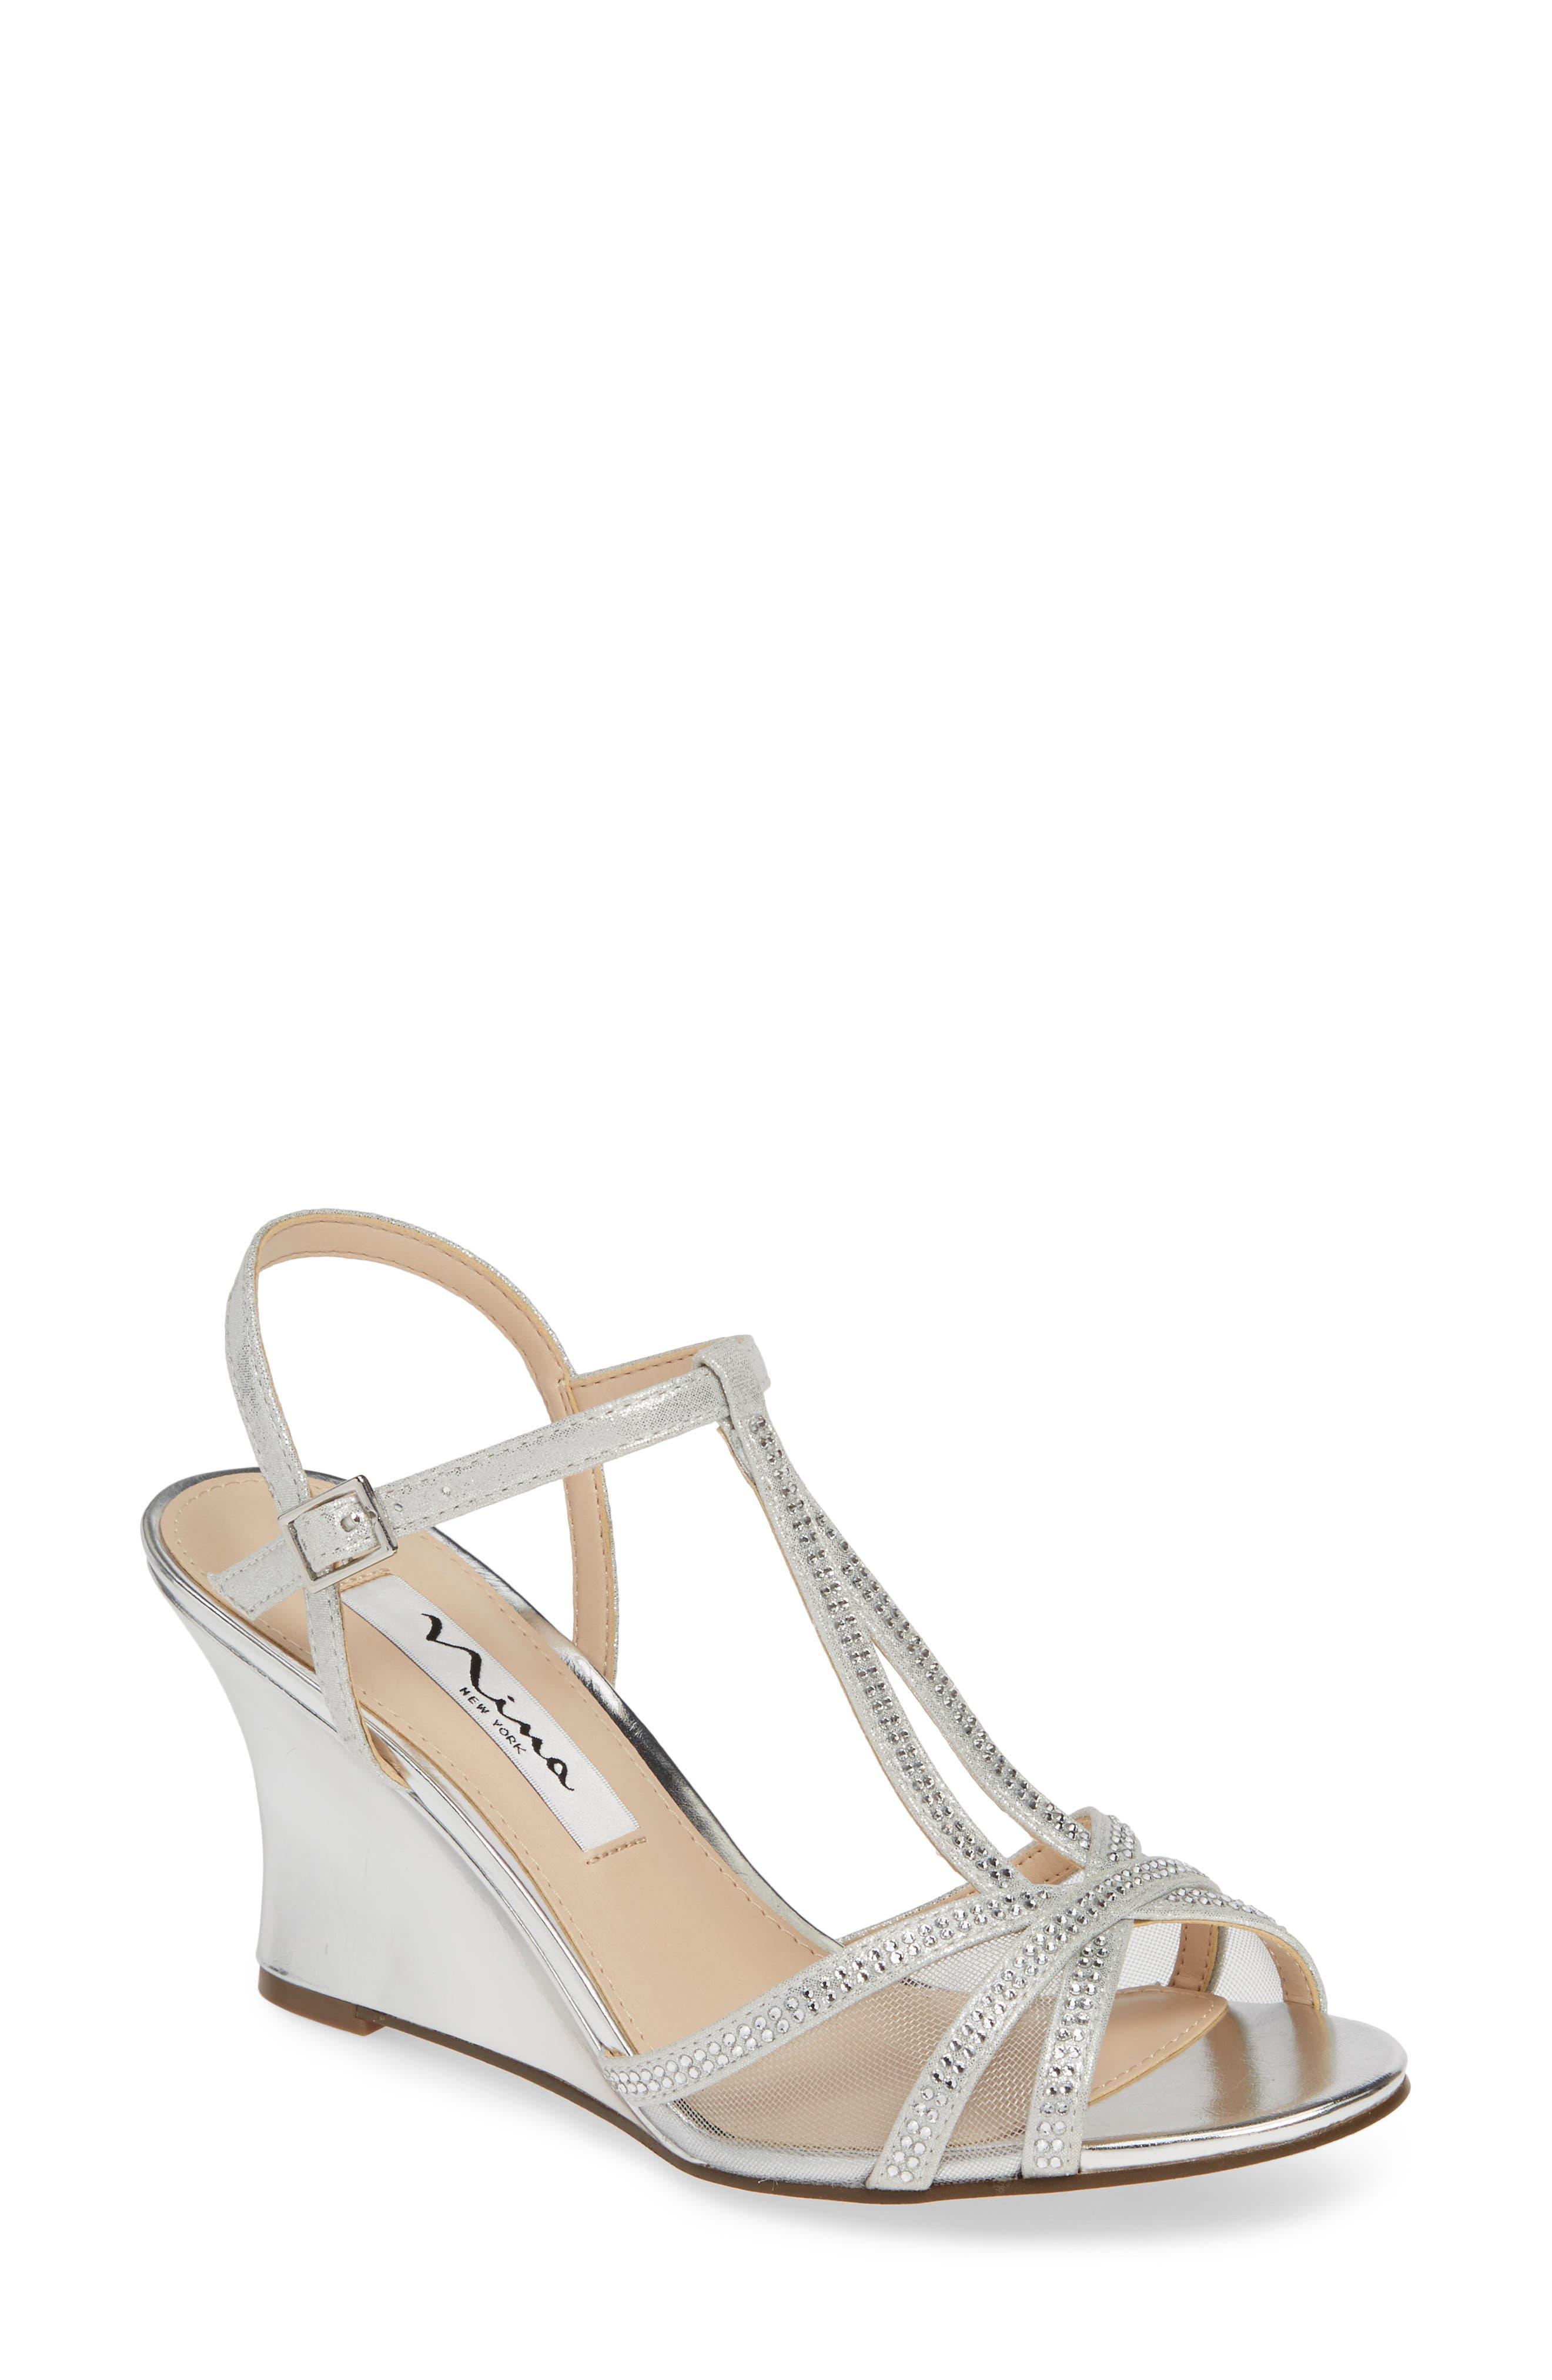 Nina Viveca Wedge Sandal, Metallic